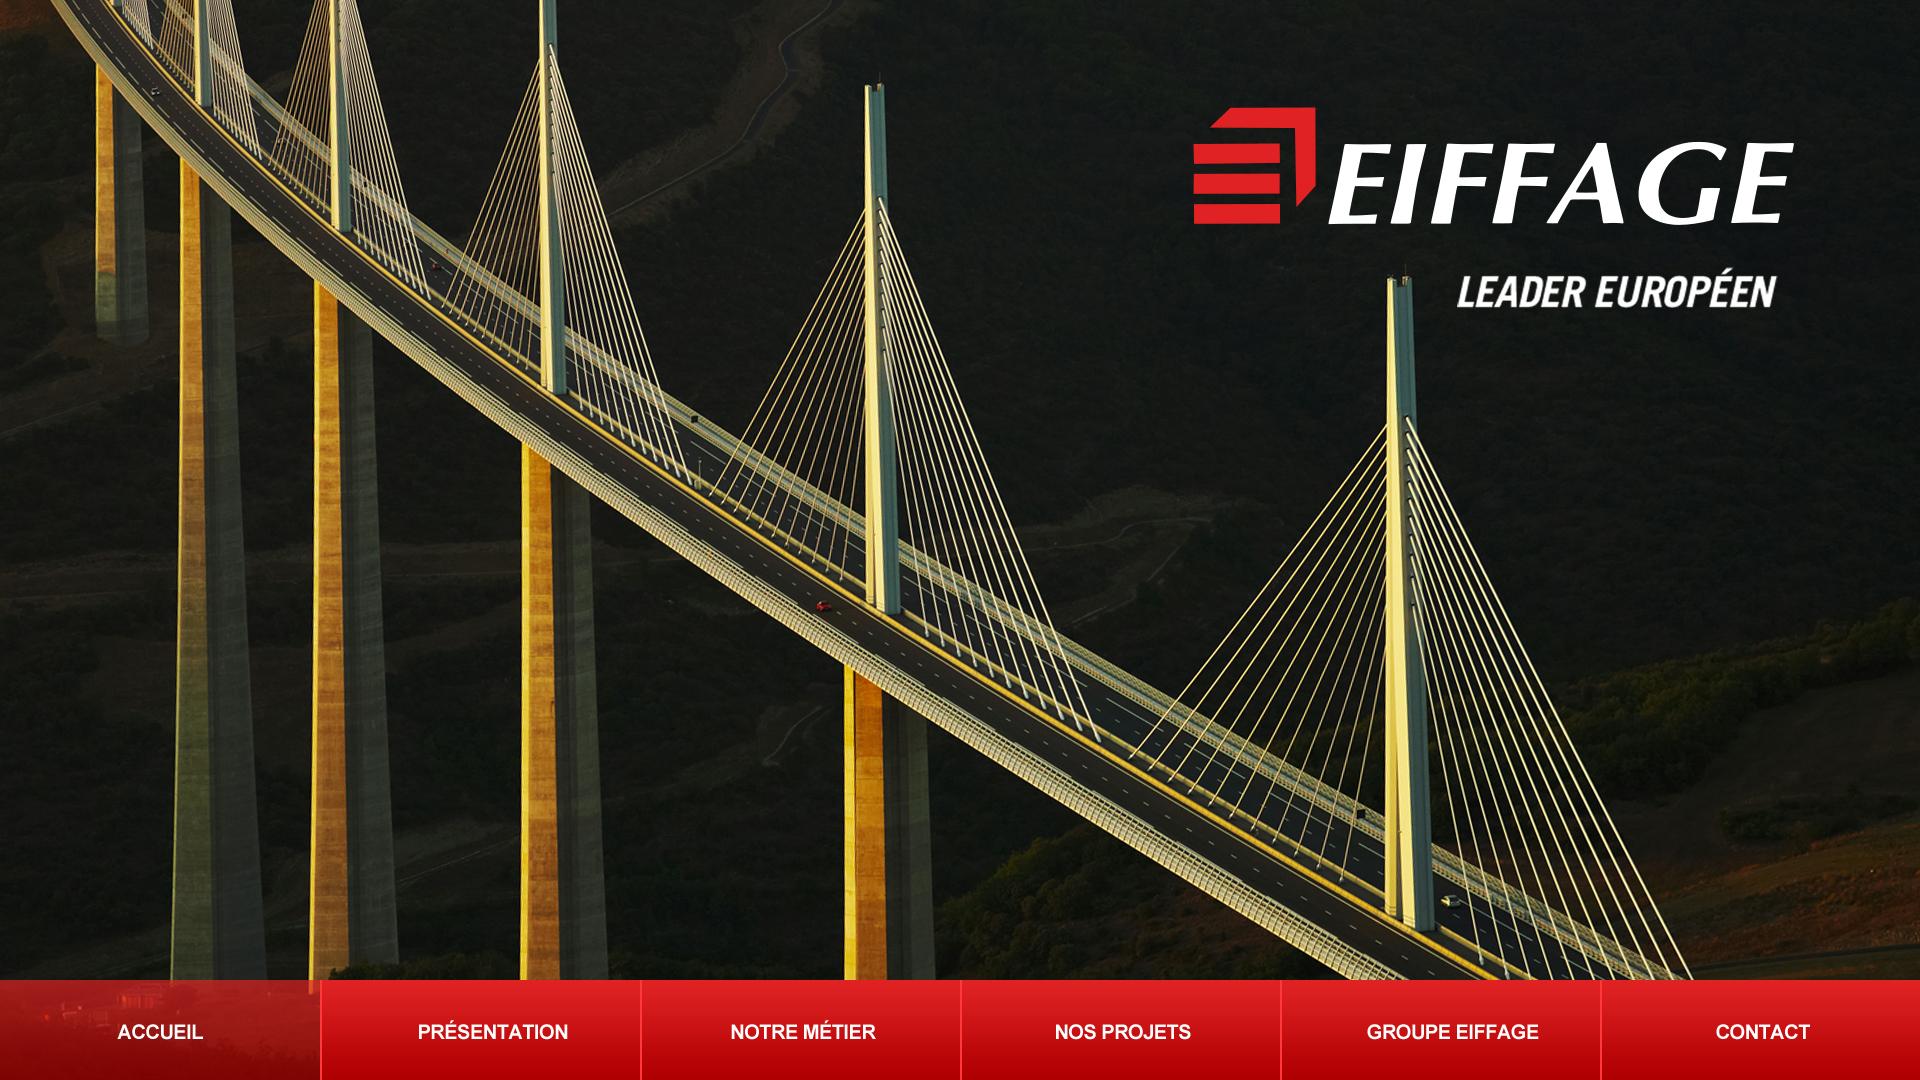 eiffage-frabeltra-creation-site-internet-webdesign-communication-caconcept-alexis-cretin-graphiste